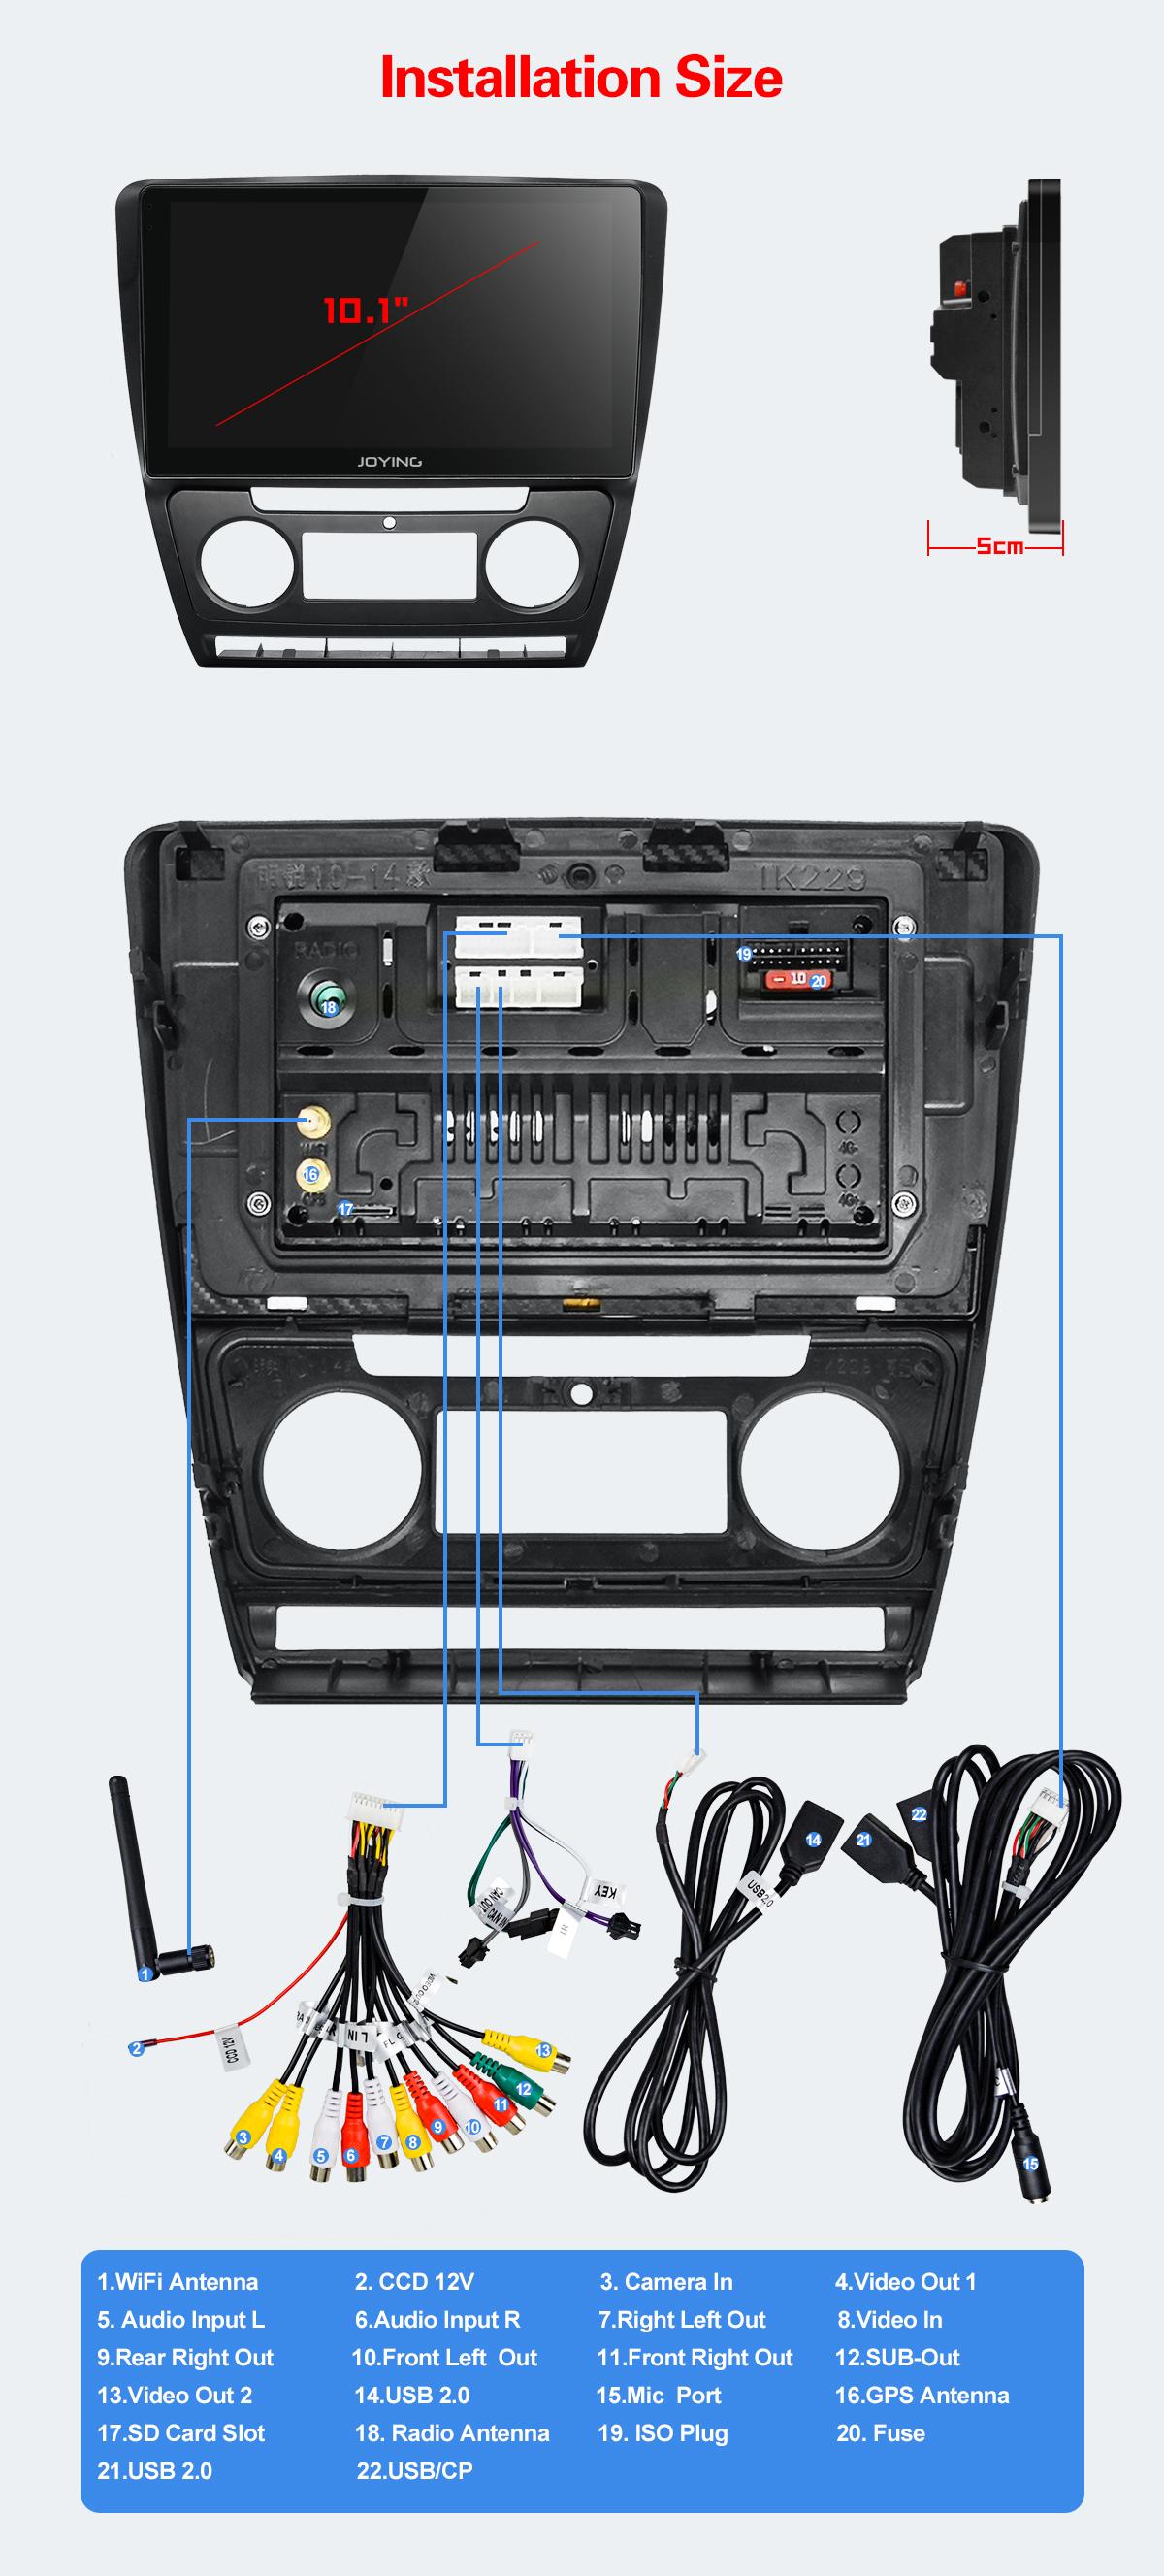 Skoda Octavia 2007 2014 Android 810 Touch Screen Car Audio System 1 Fuse Box 1joying Head Units Cant Support Like Below Ipod Original Gps Antenna Back Up Rear Camera Bluetoothoriginal Usb And